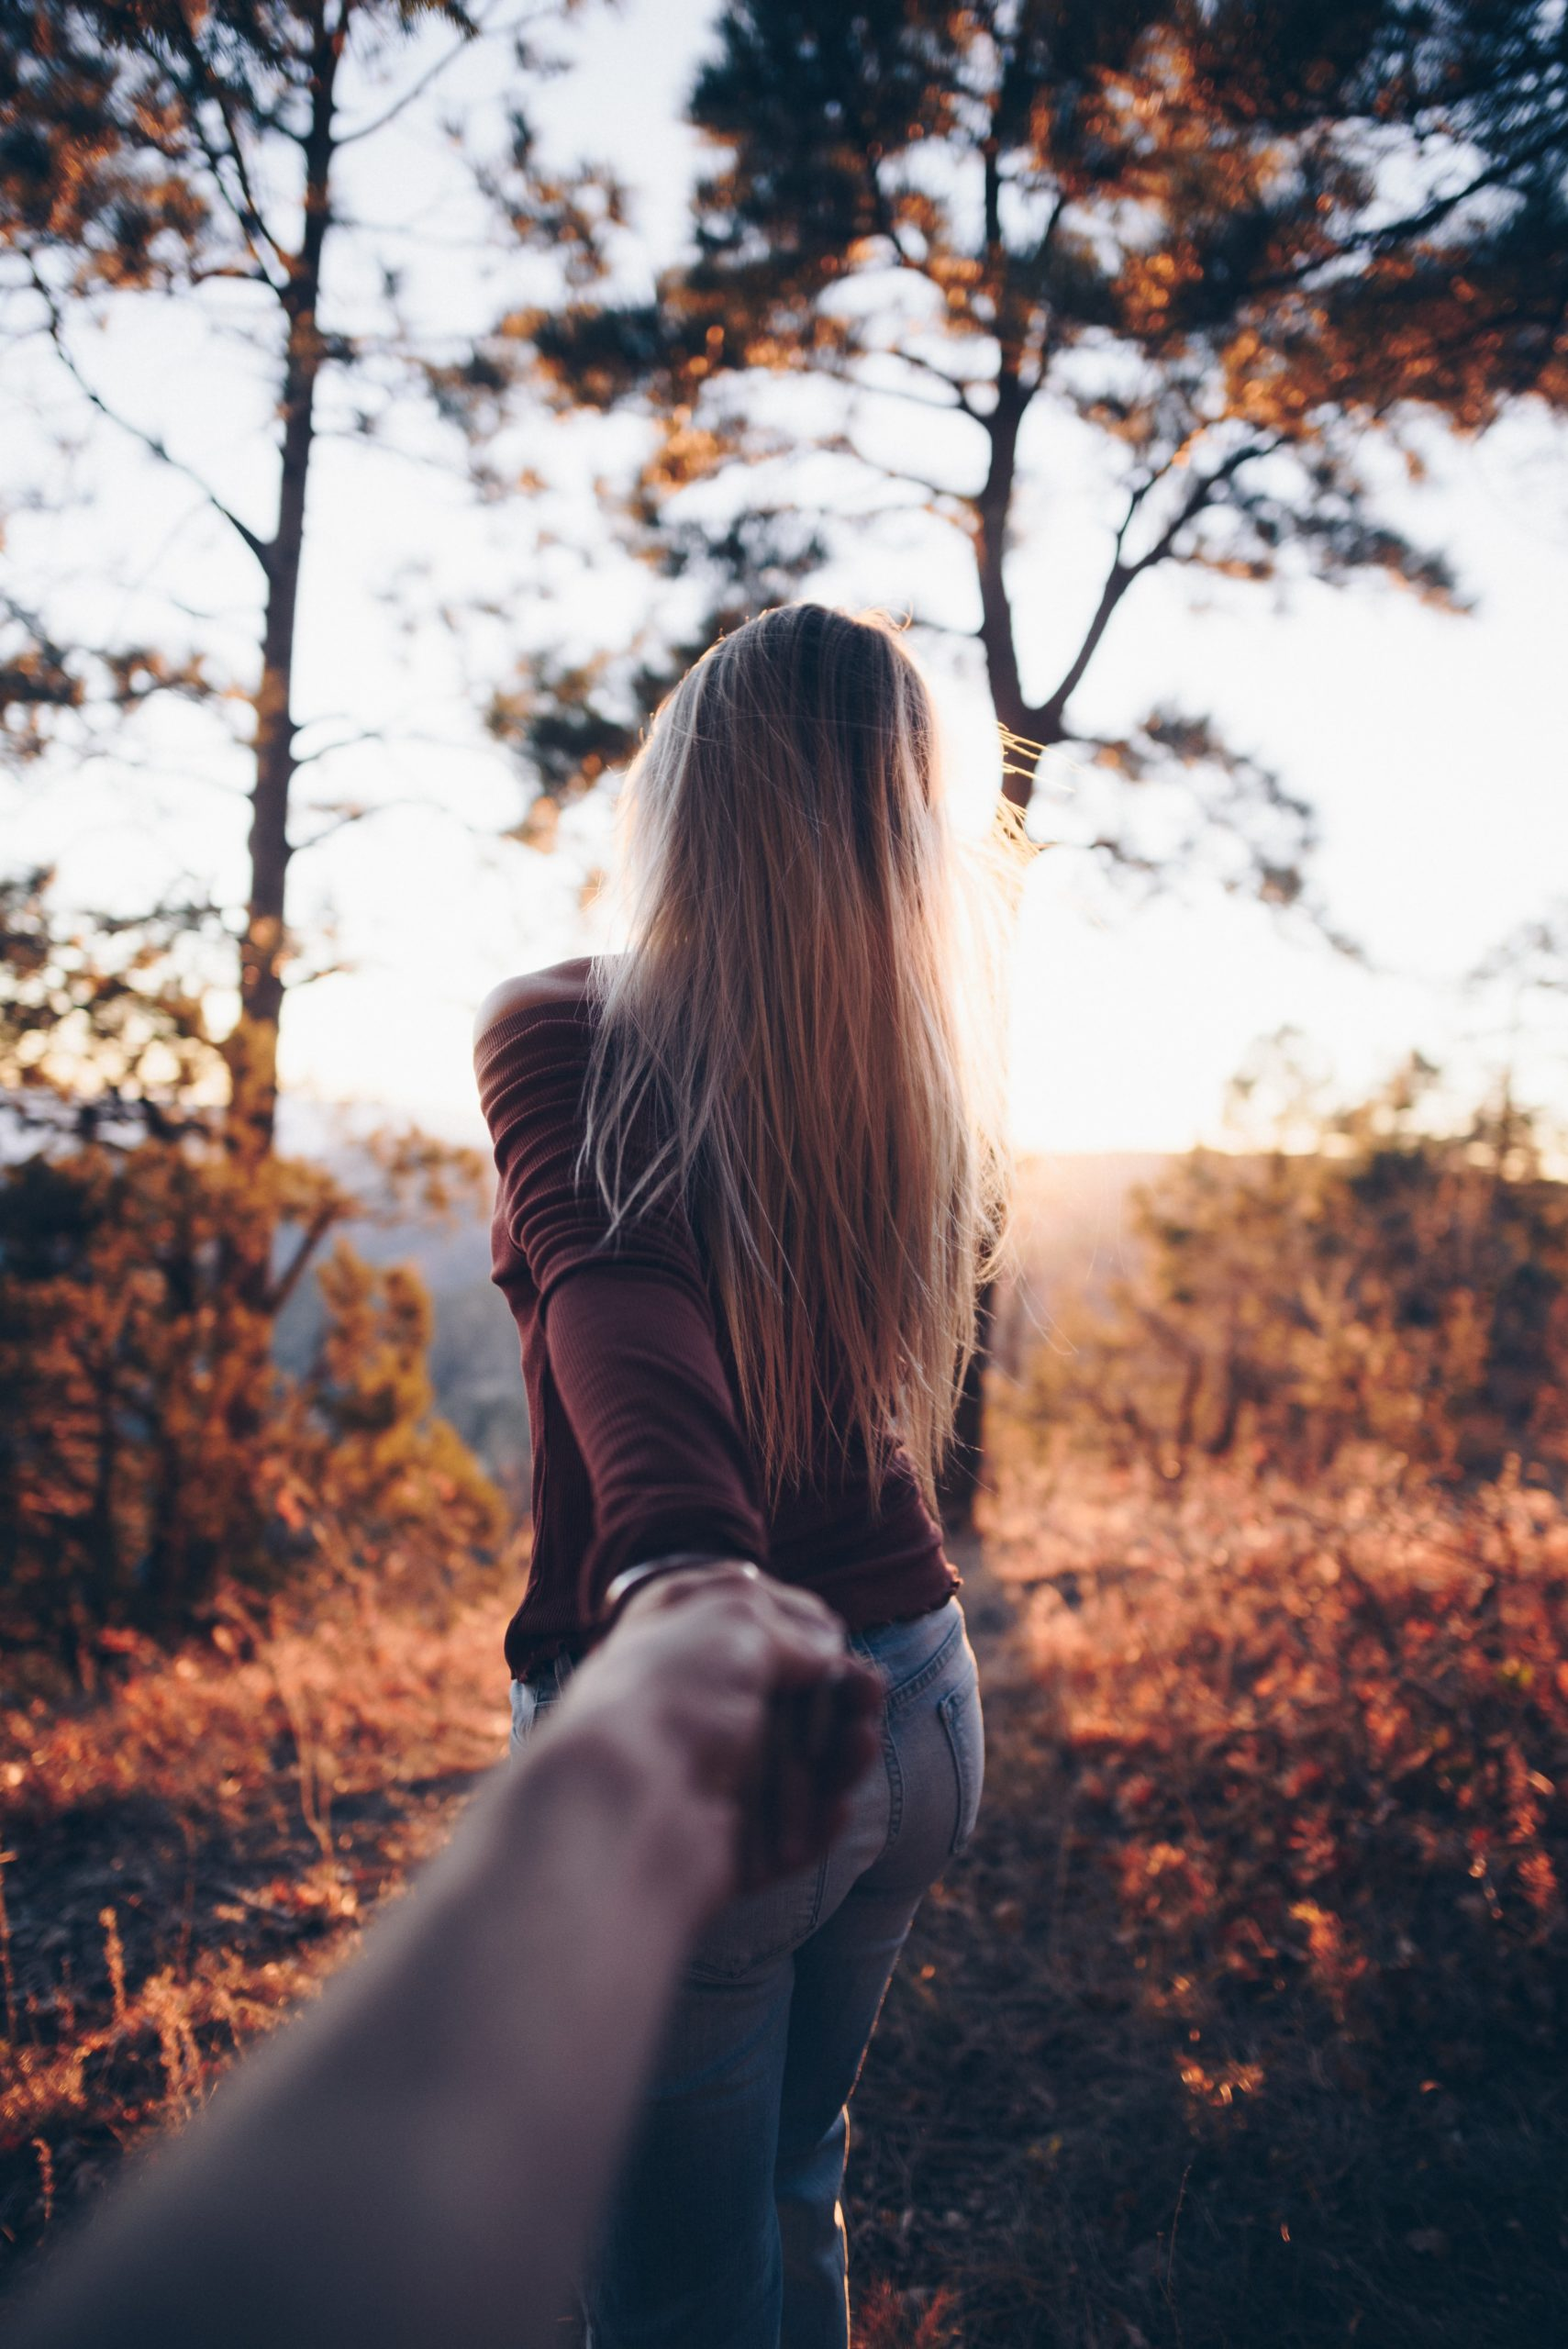 Romantikurlaub